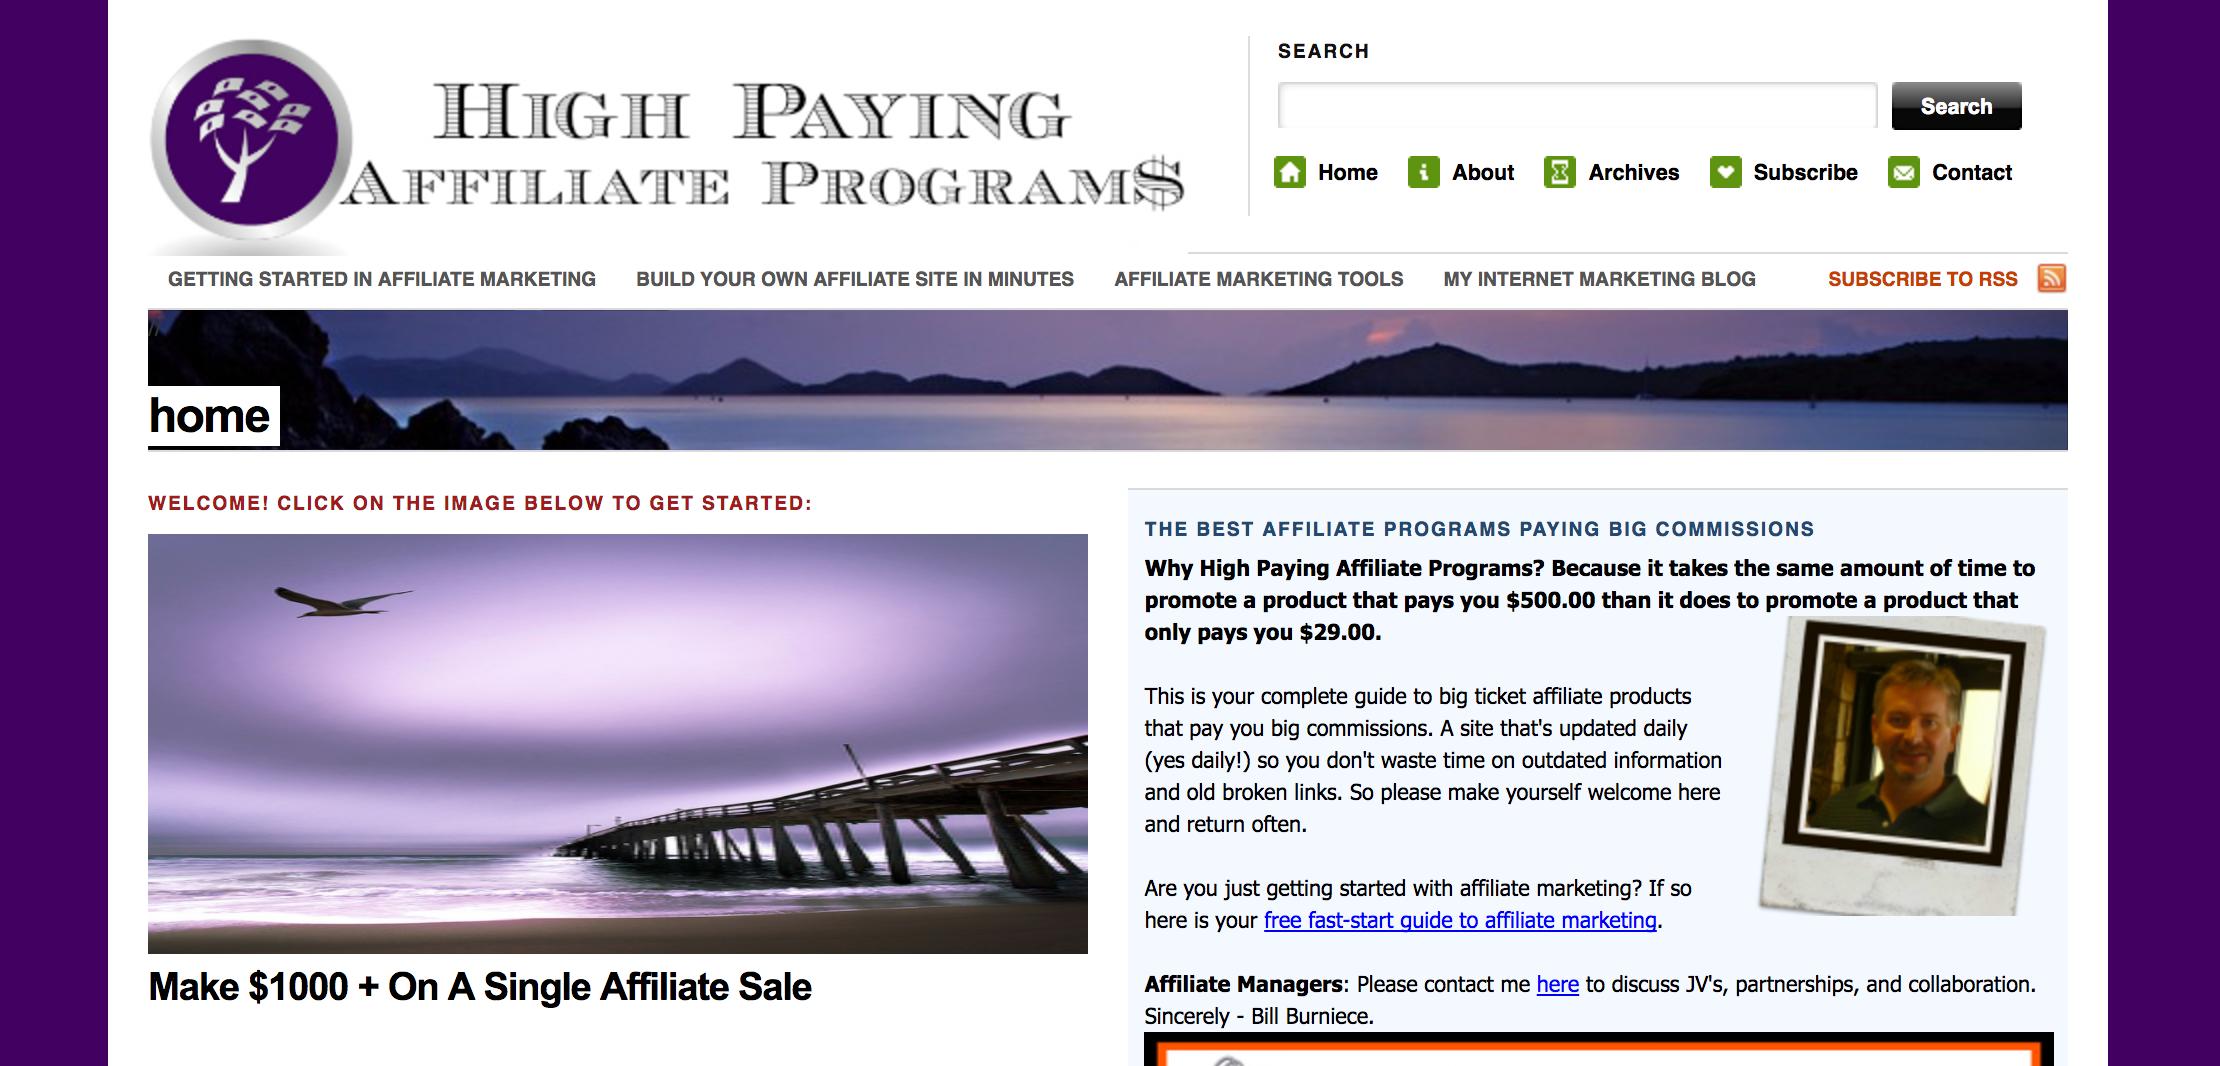 High Paying Affiliate Programs Blog